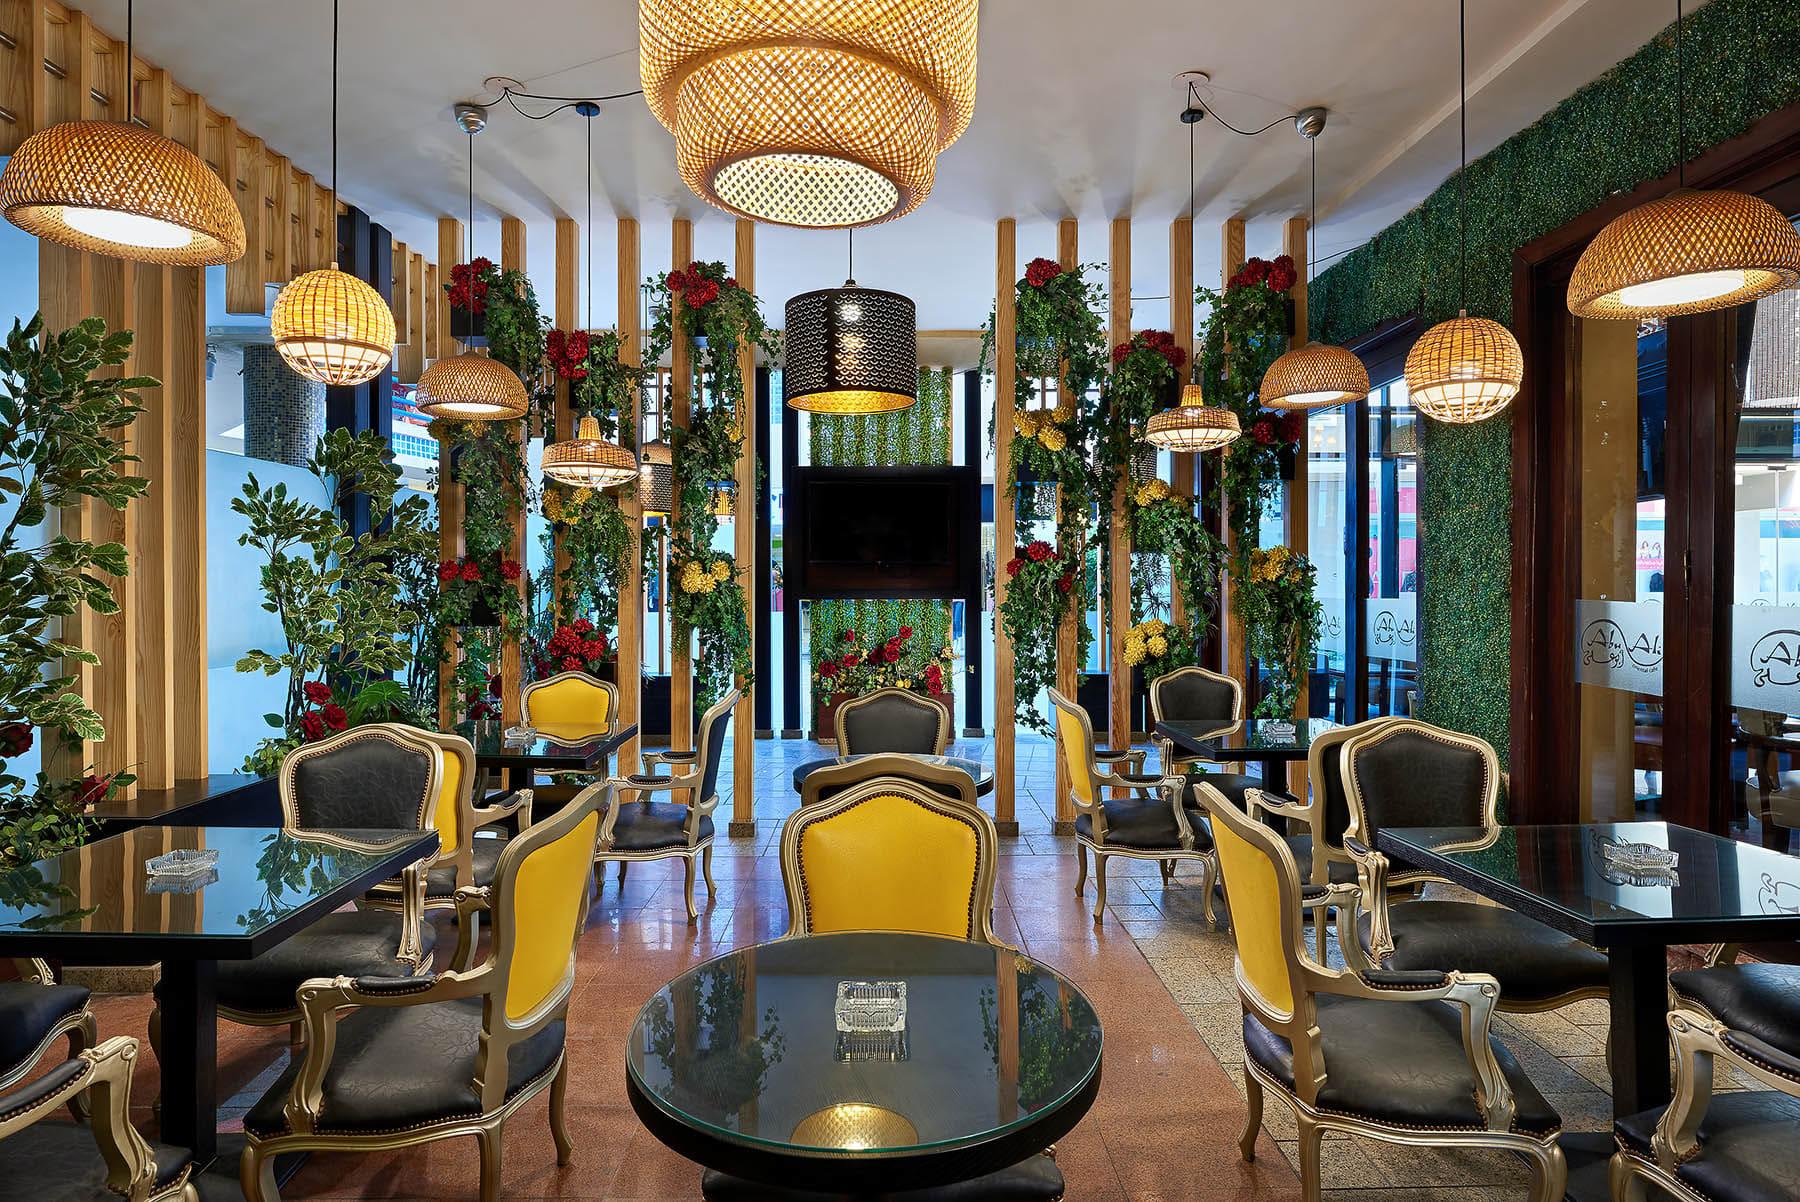 Gazibo Lounge - Hilton Alexandria Green Plaza Hotel